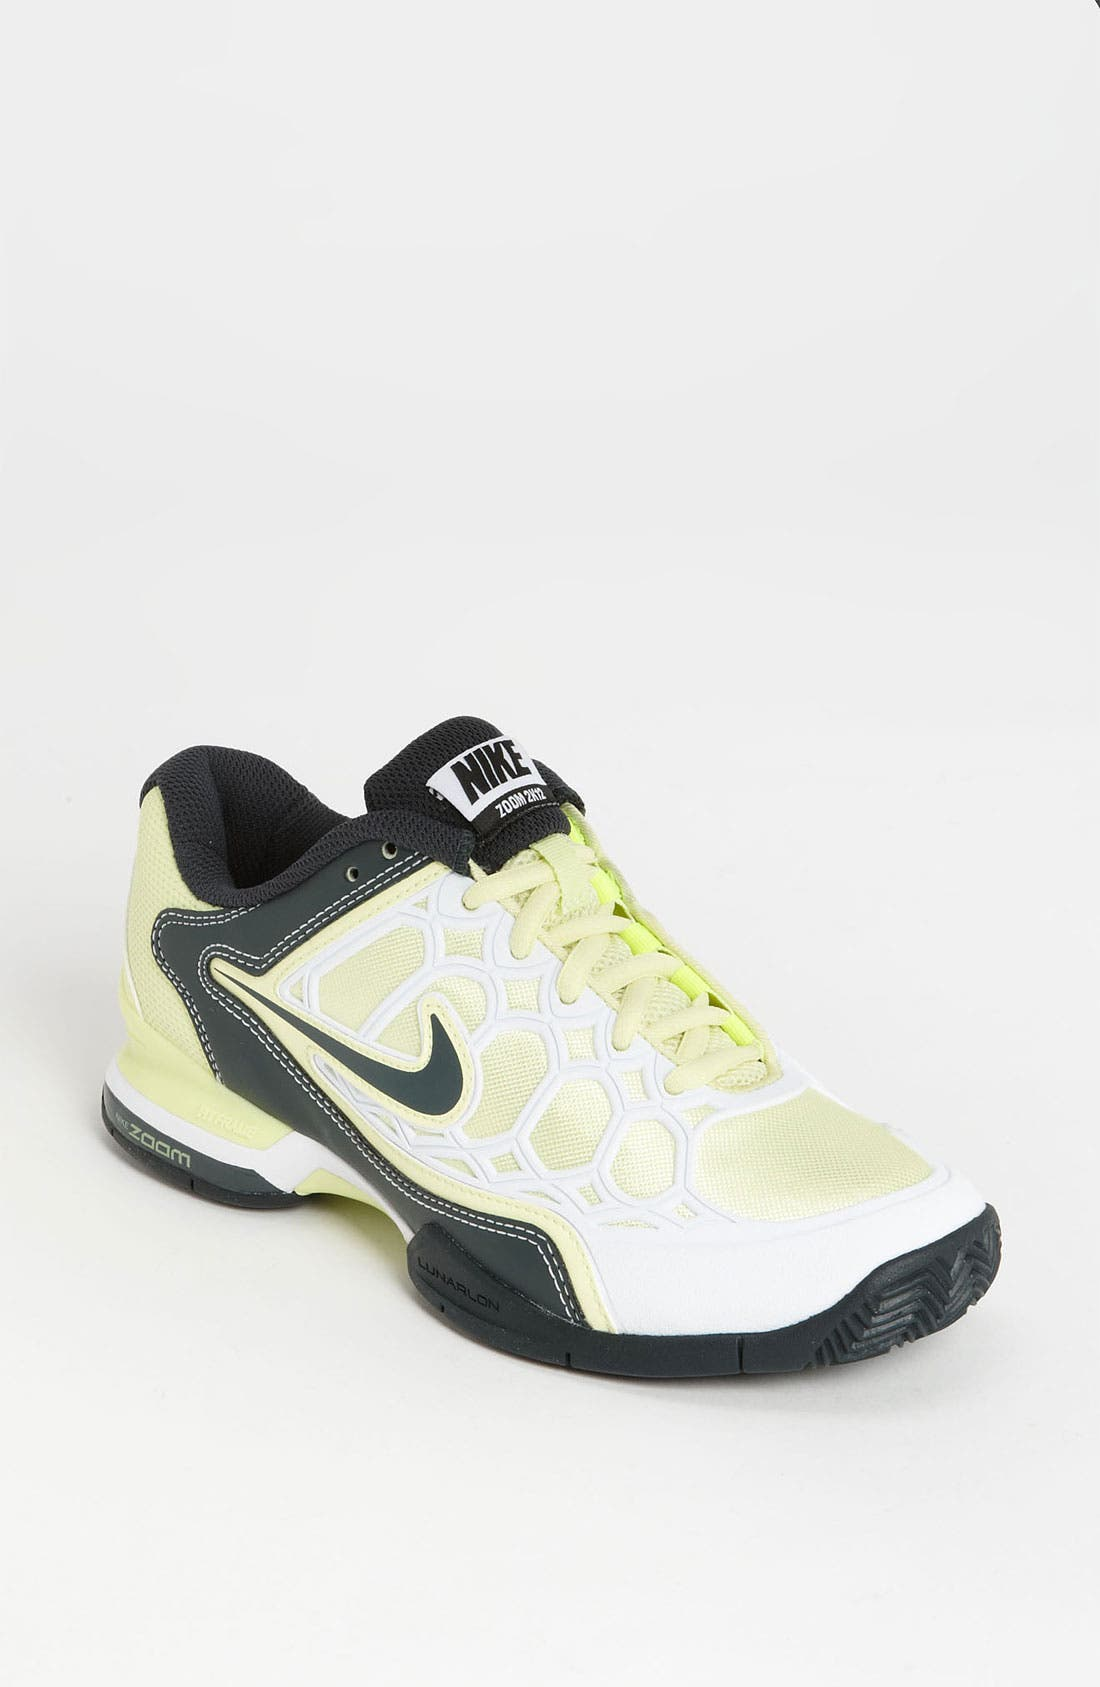 Alternate Image 1 Selected - Nike 'Zoom Breathe 2K12' Tennis Shoe (Women)